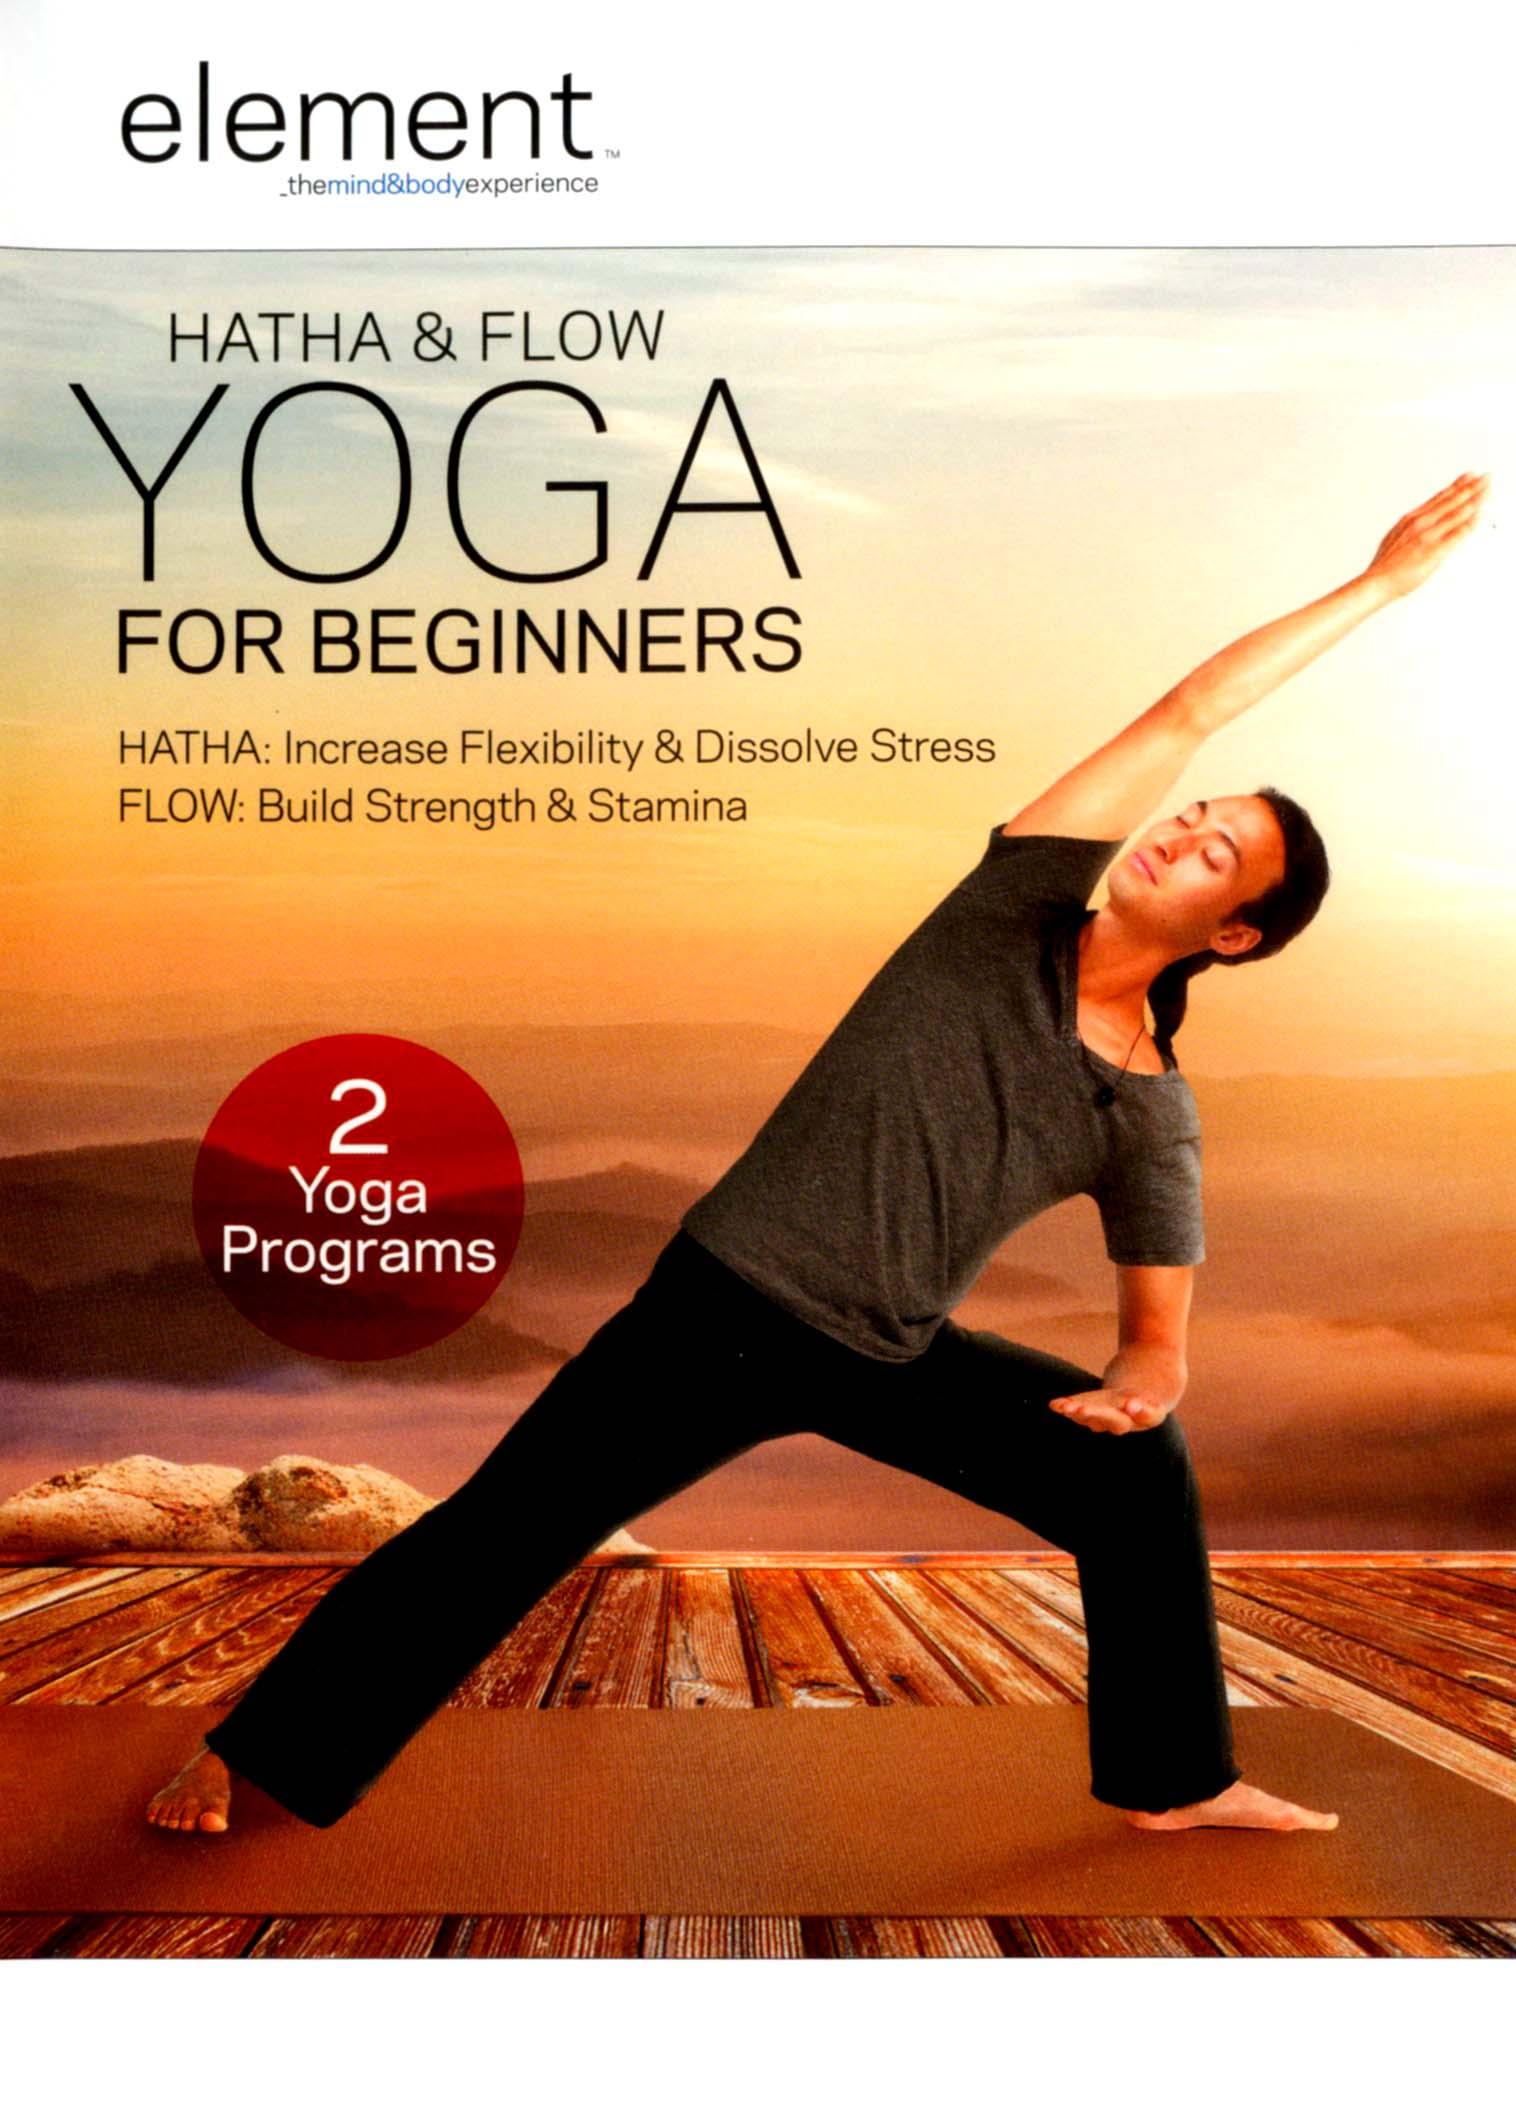 Element: Hatha & Flow Yoga for Beginners